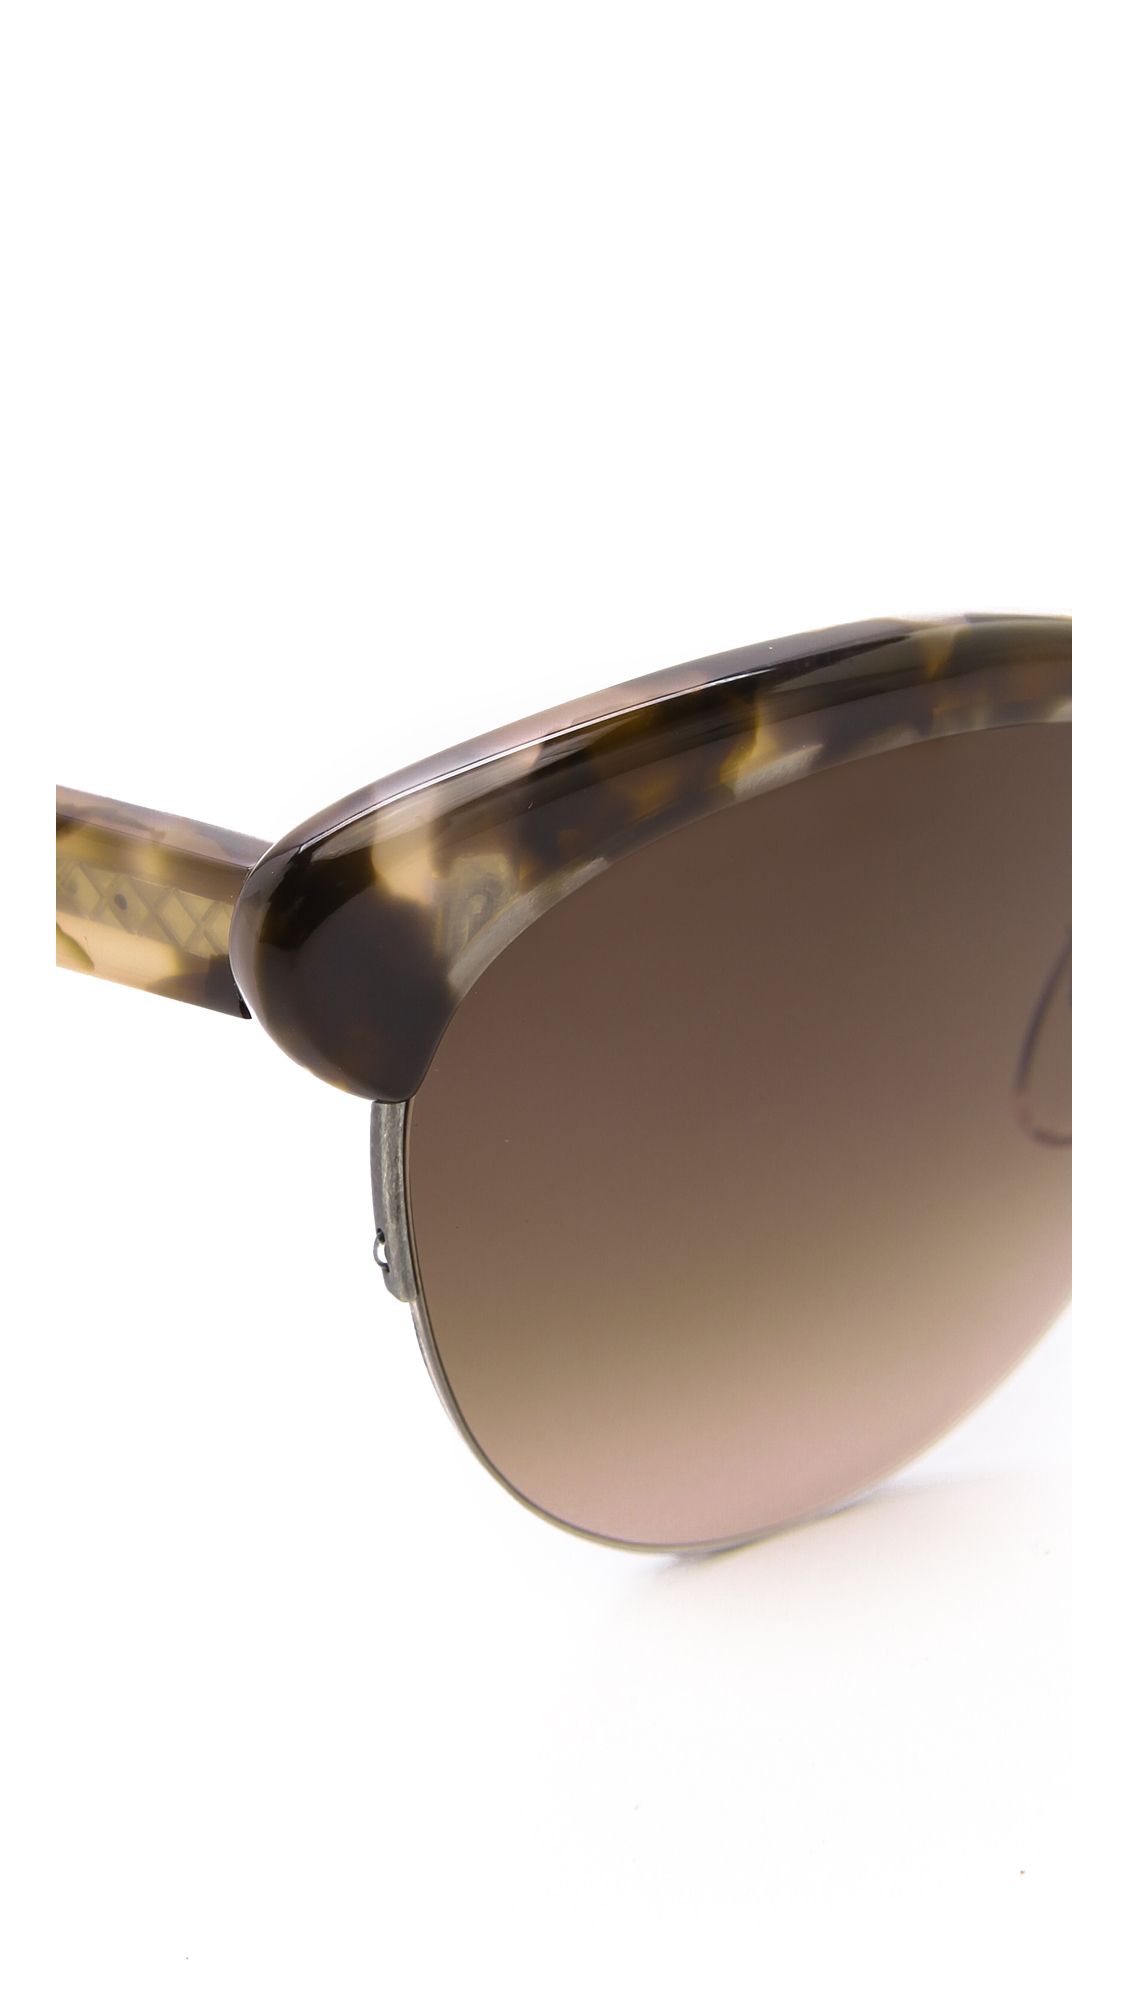 Bottom Rimless Glasses : Bottega veneta Rimless Bottom Sunglasses Havana Honeybrown ...